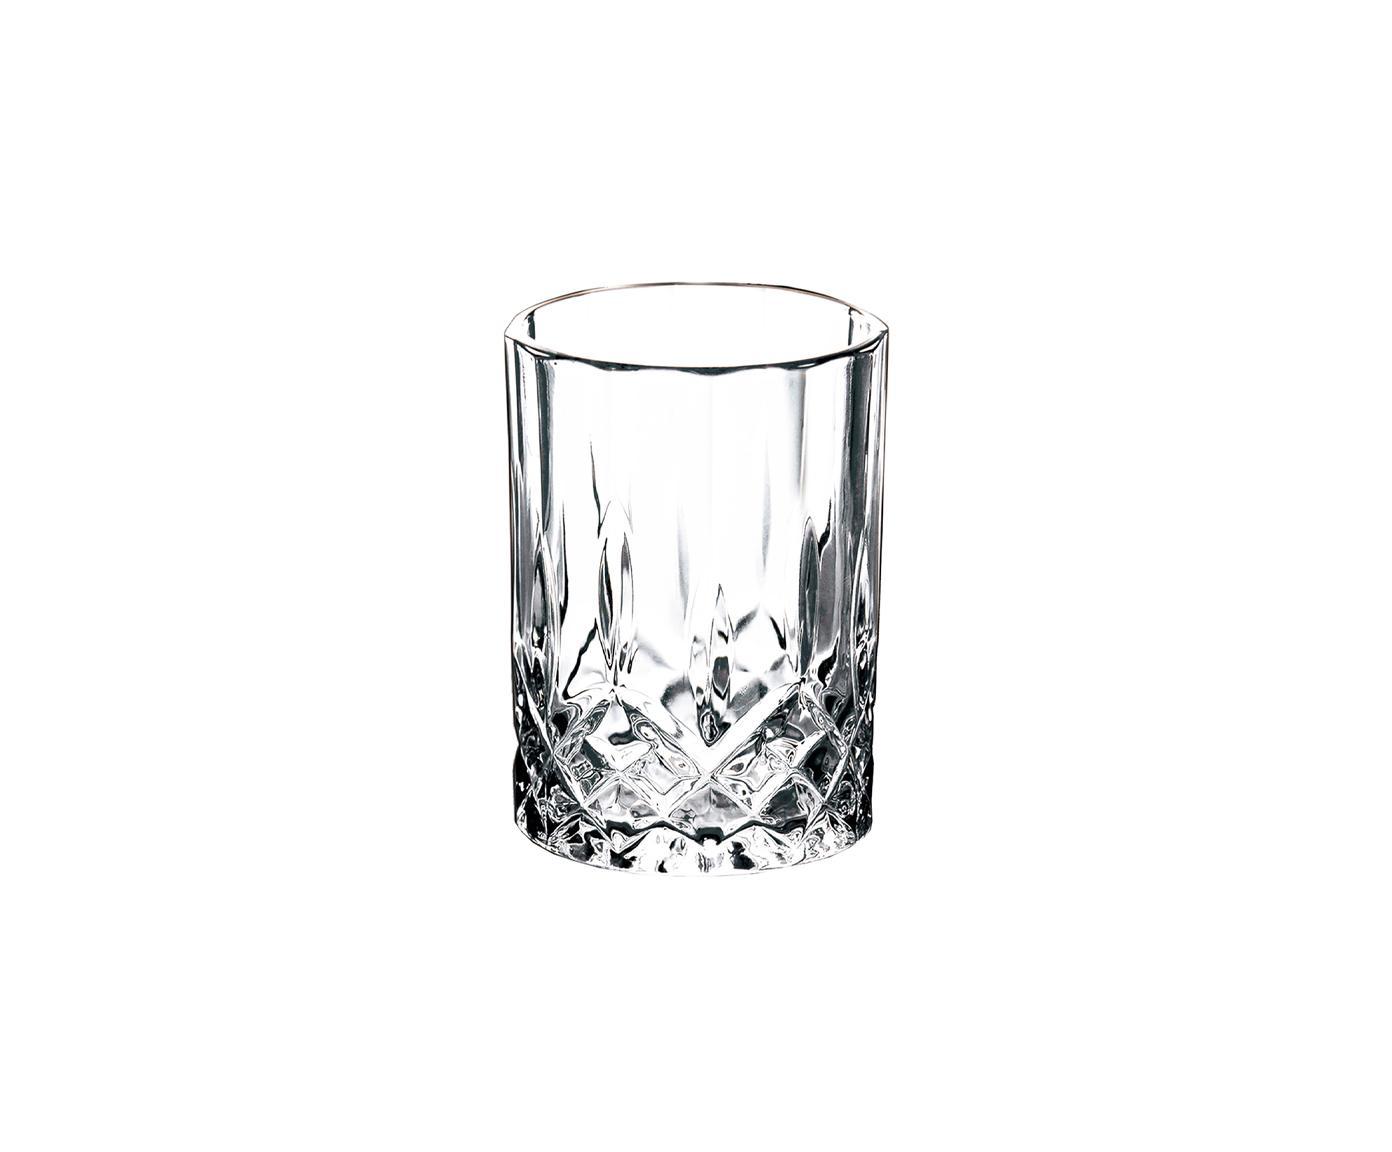 Bicchieri con motivo in rilievo Harvey 4 pz, Vetro, Trasparente, Ø 6 x Alt. 8 cm